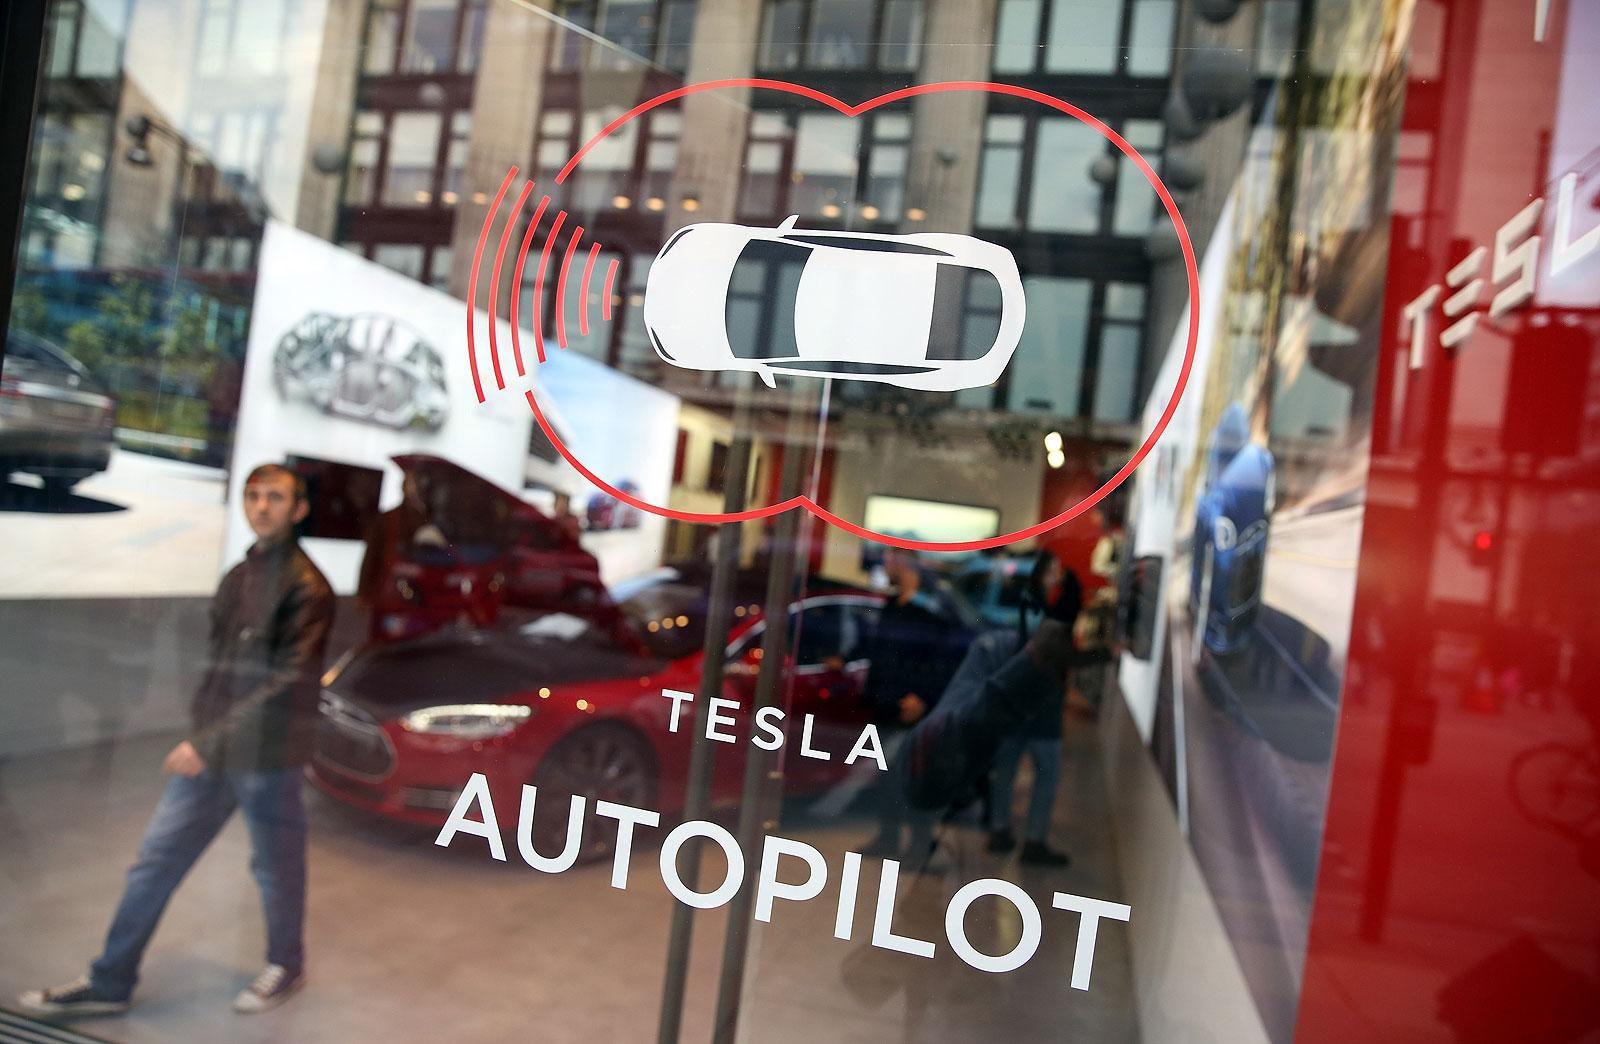 First fatal crash of a 'selfdriving' Tesla prompts